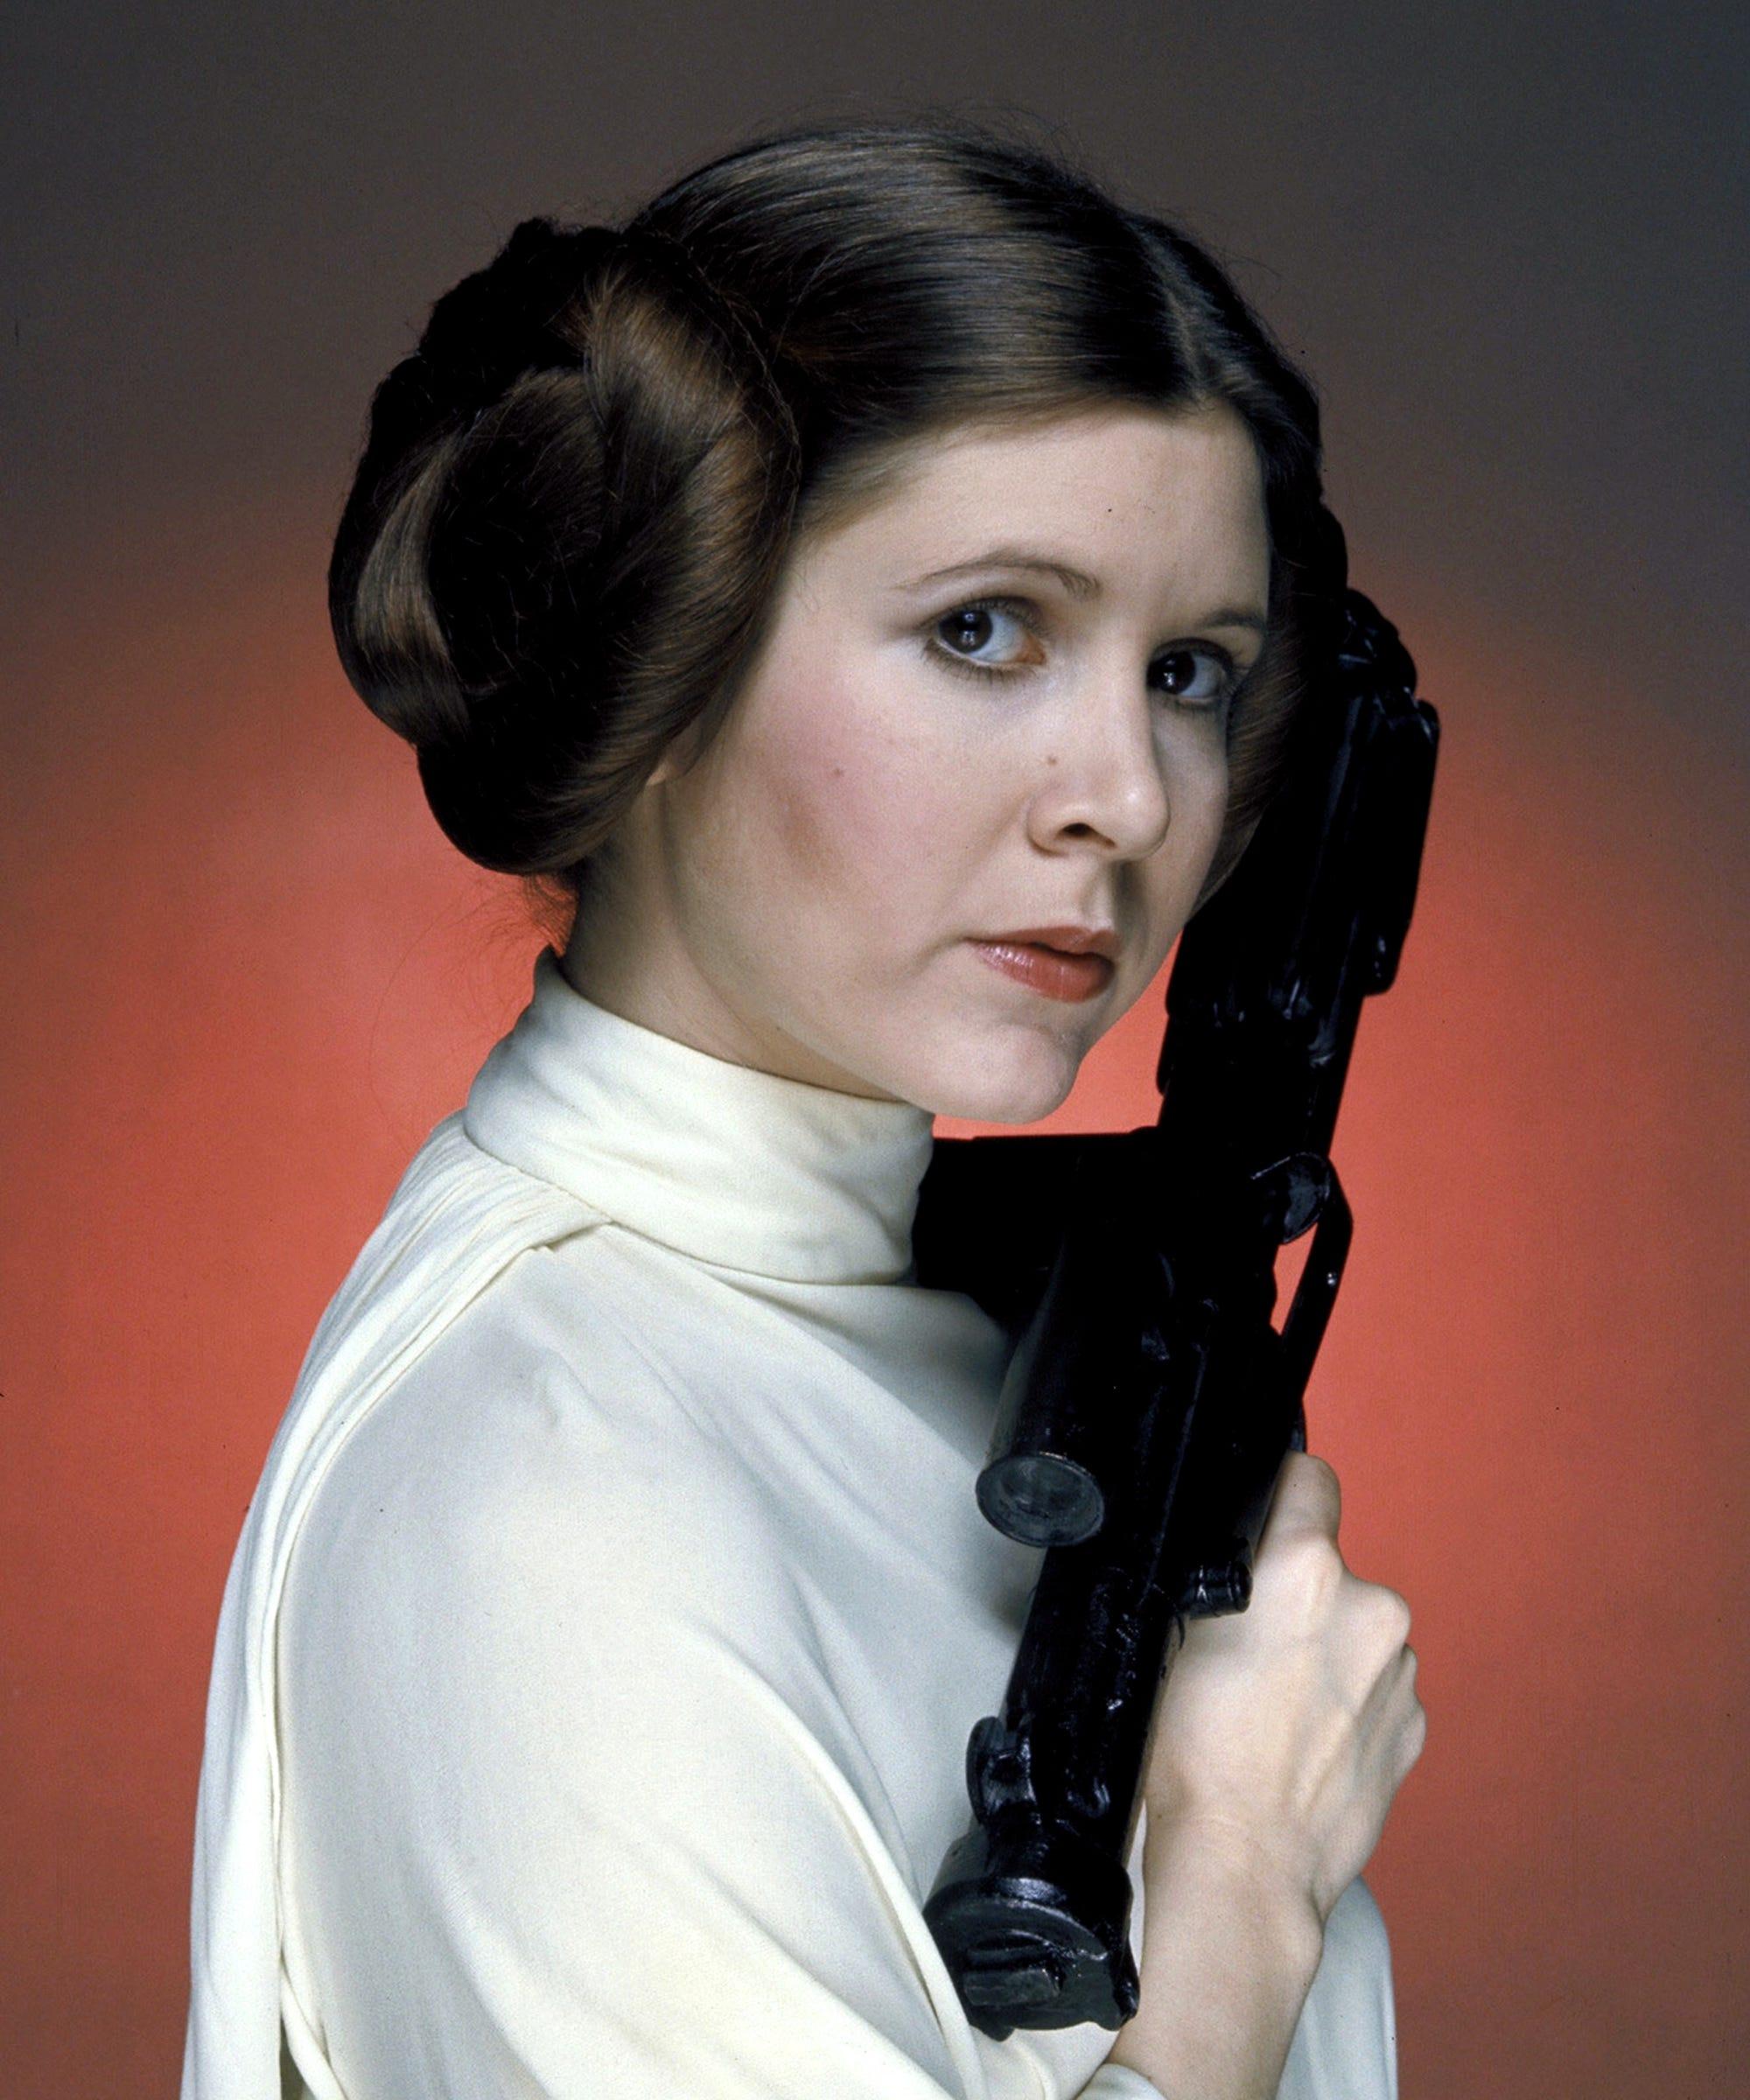 Jabba The Hutt Fucks Princess Leia Complete carrie fisher princess leia feminism